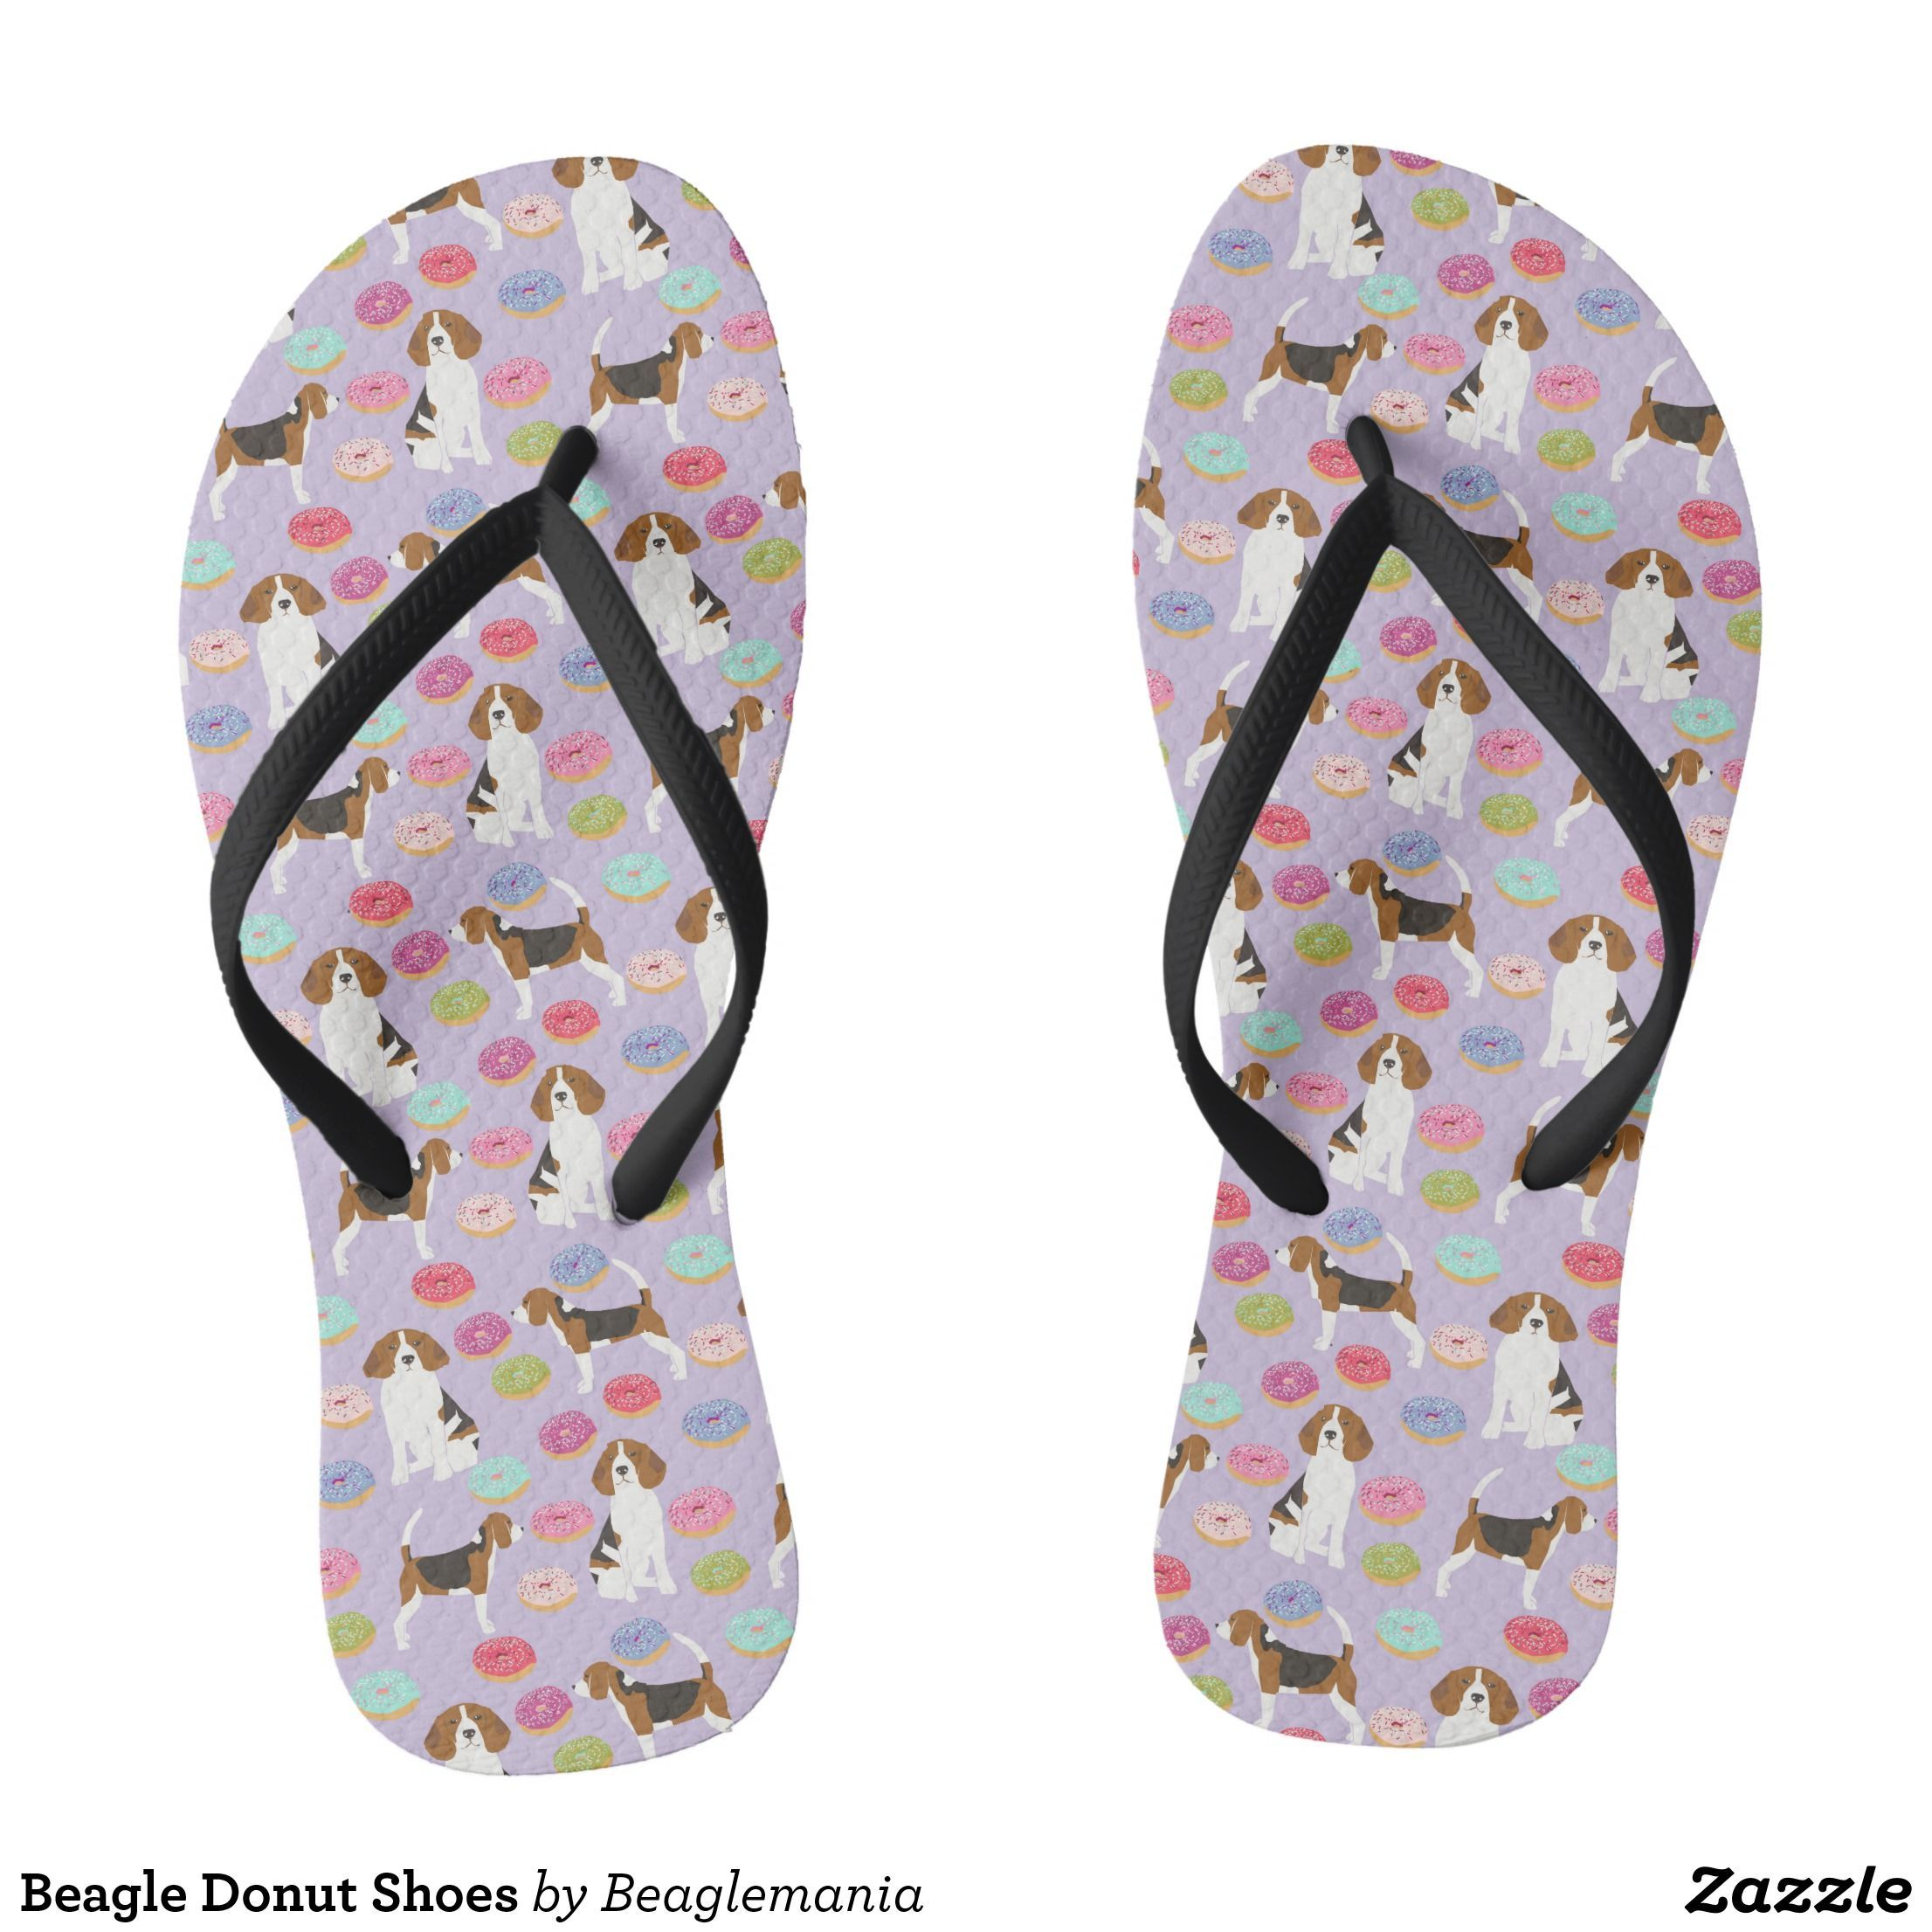 96f6b4926161 Beagle Donut Shoes Flip Flops - Durable Thong Style Hawaiian Beach Sandals  By Talented Fashion